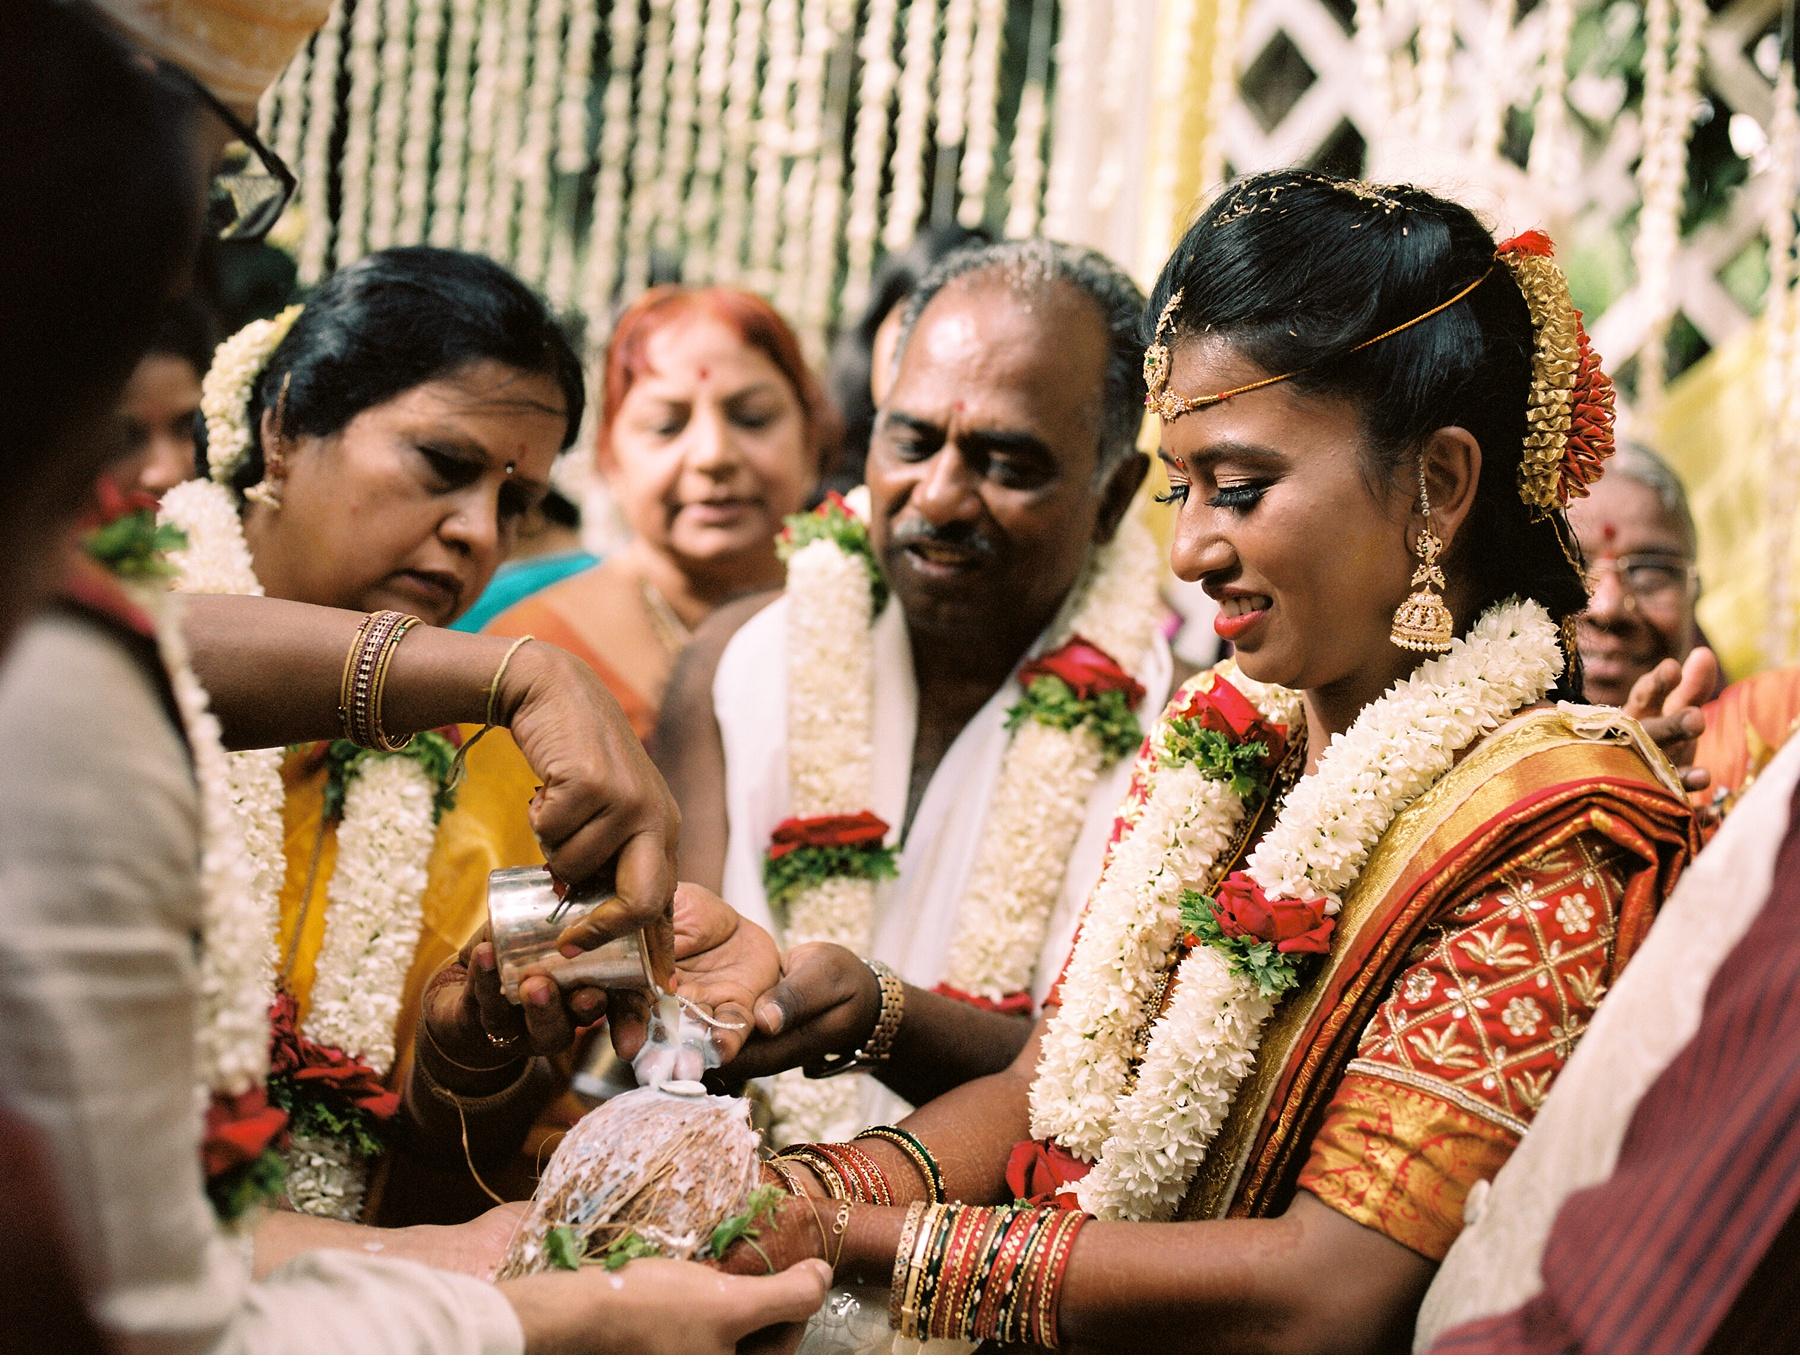 Southern_India_Wedding_Ceremony_0007.jpg